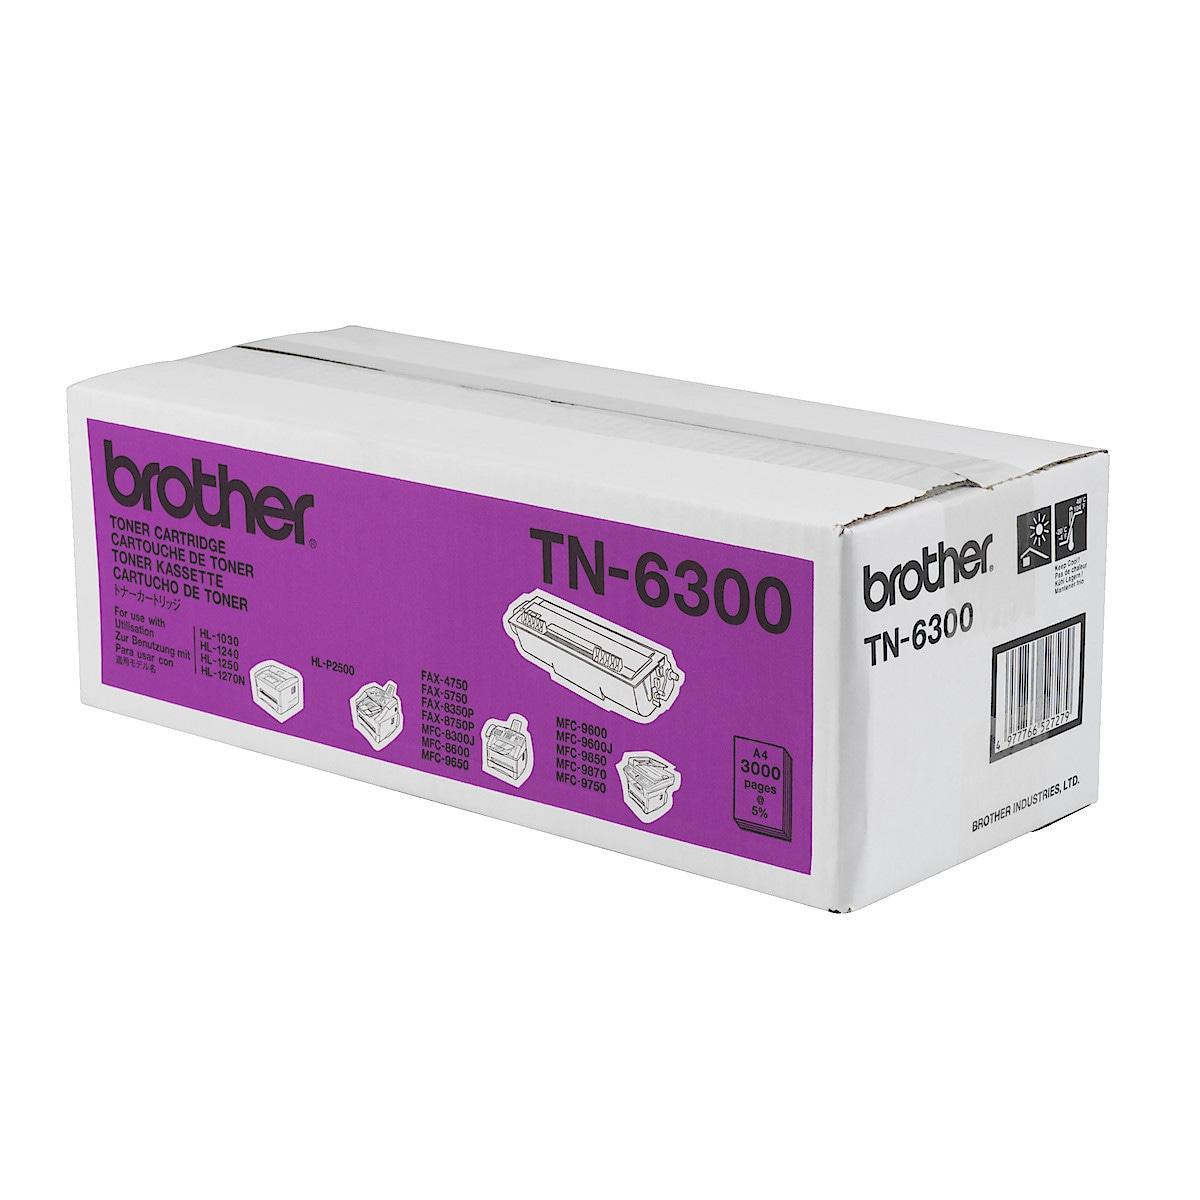 Brother TN-6300 toner